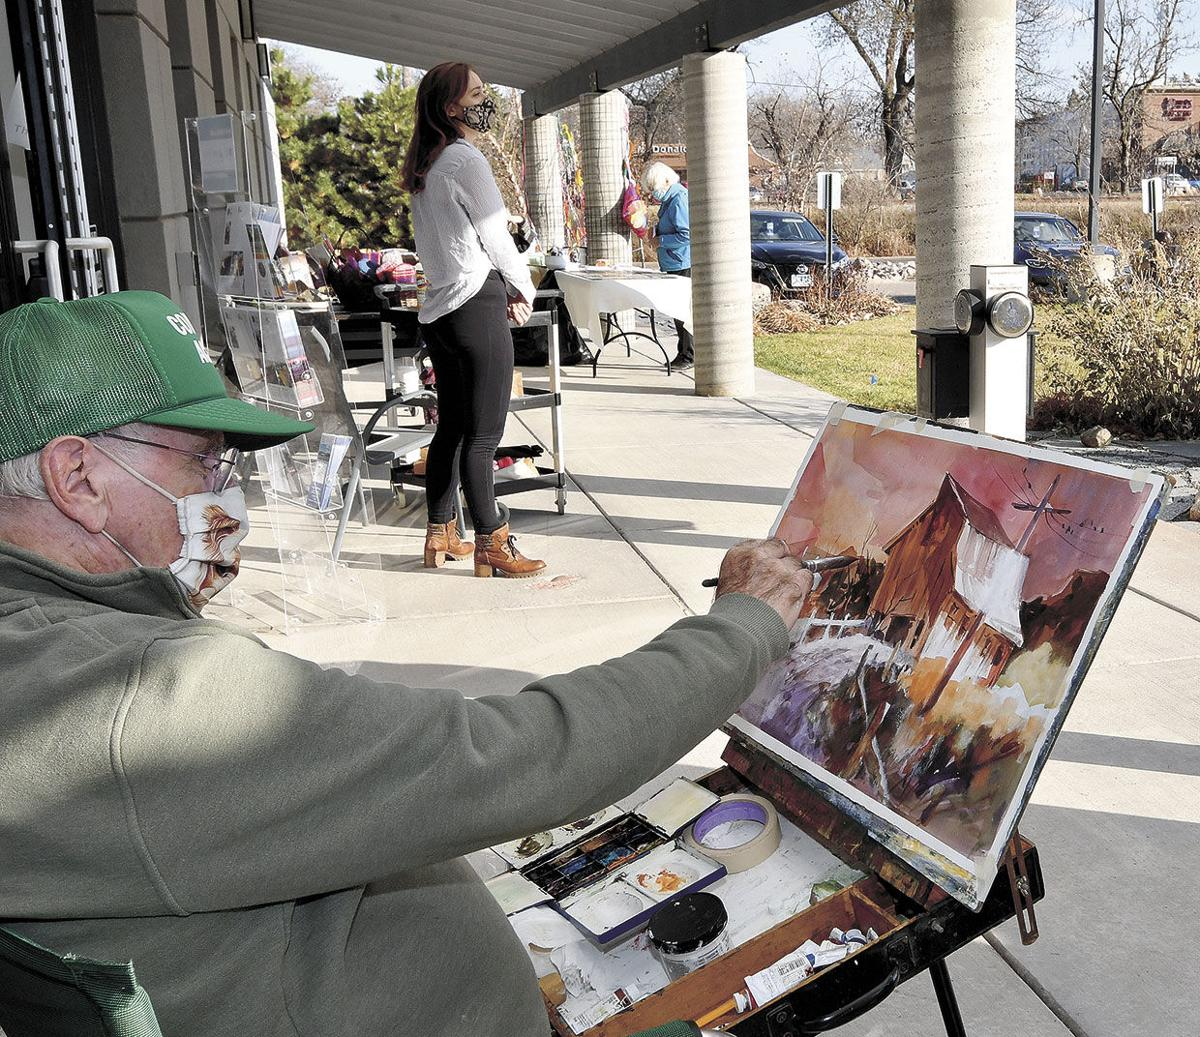 Outdoor arts market continues